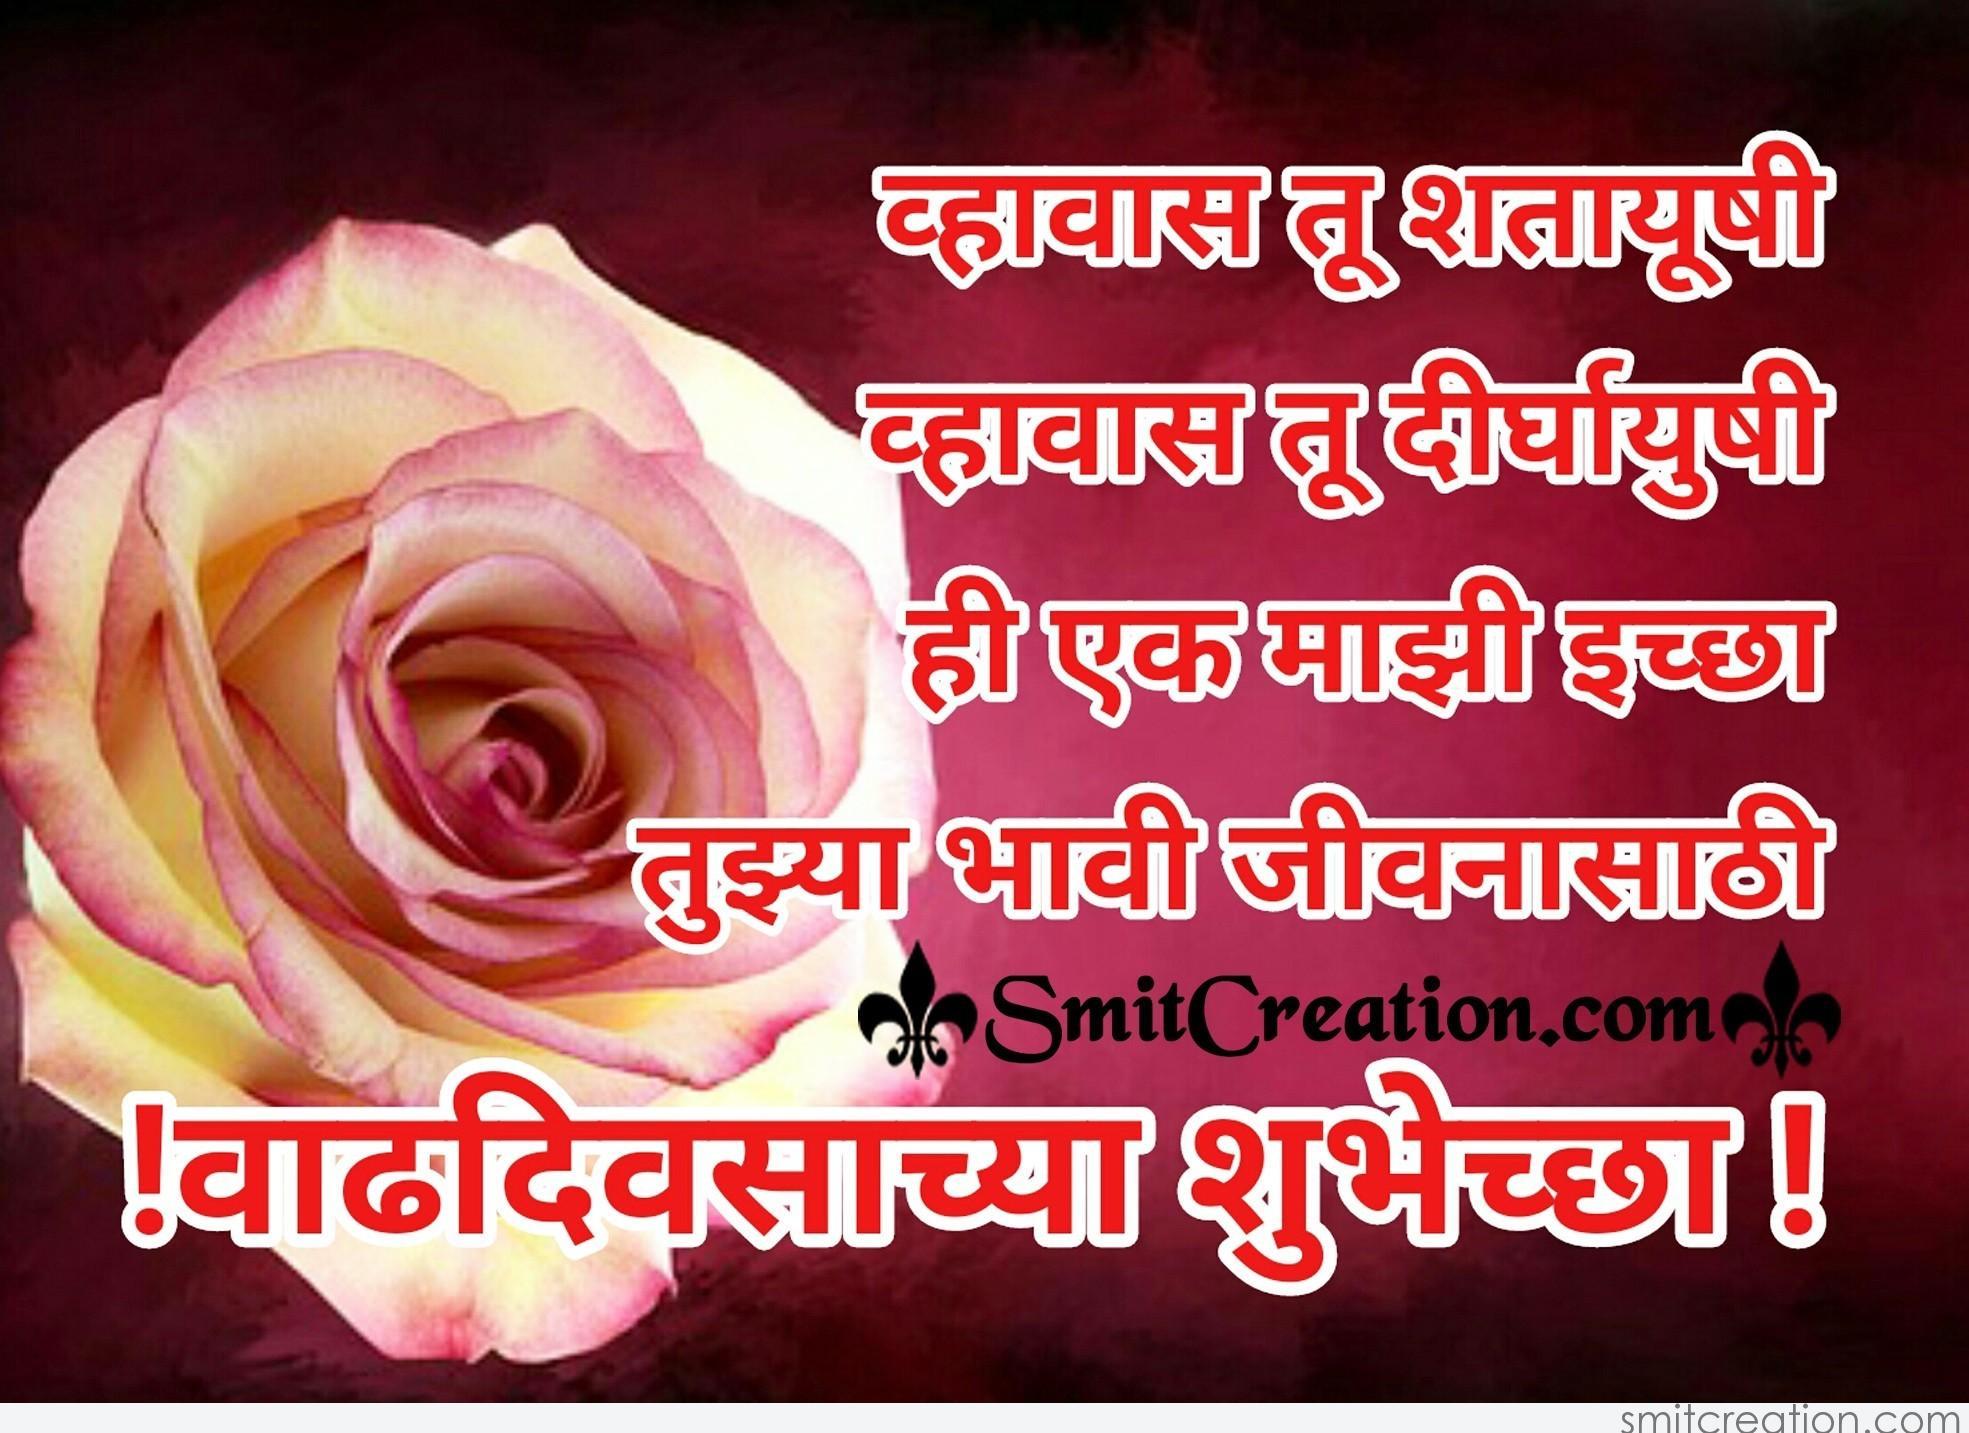 Vadhdivsachya Hardik Shubhechha | www.imgkid.com - The ... Vadhdivas Chya Hardik Shubhechha Hd